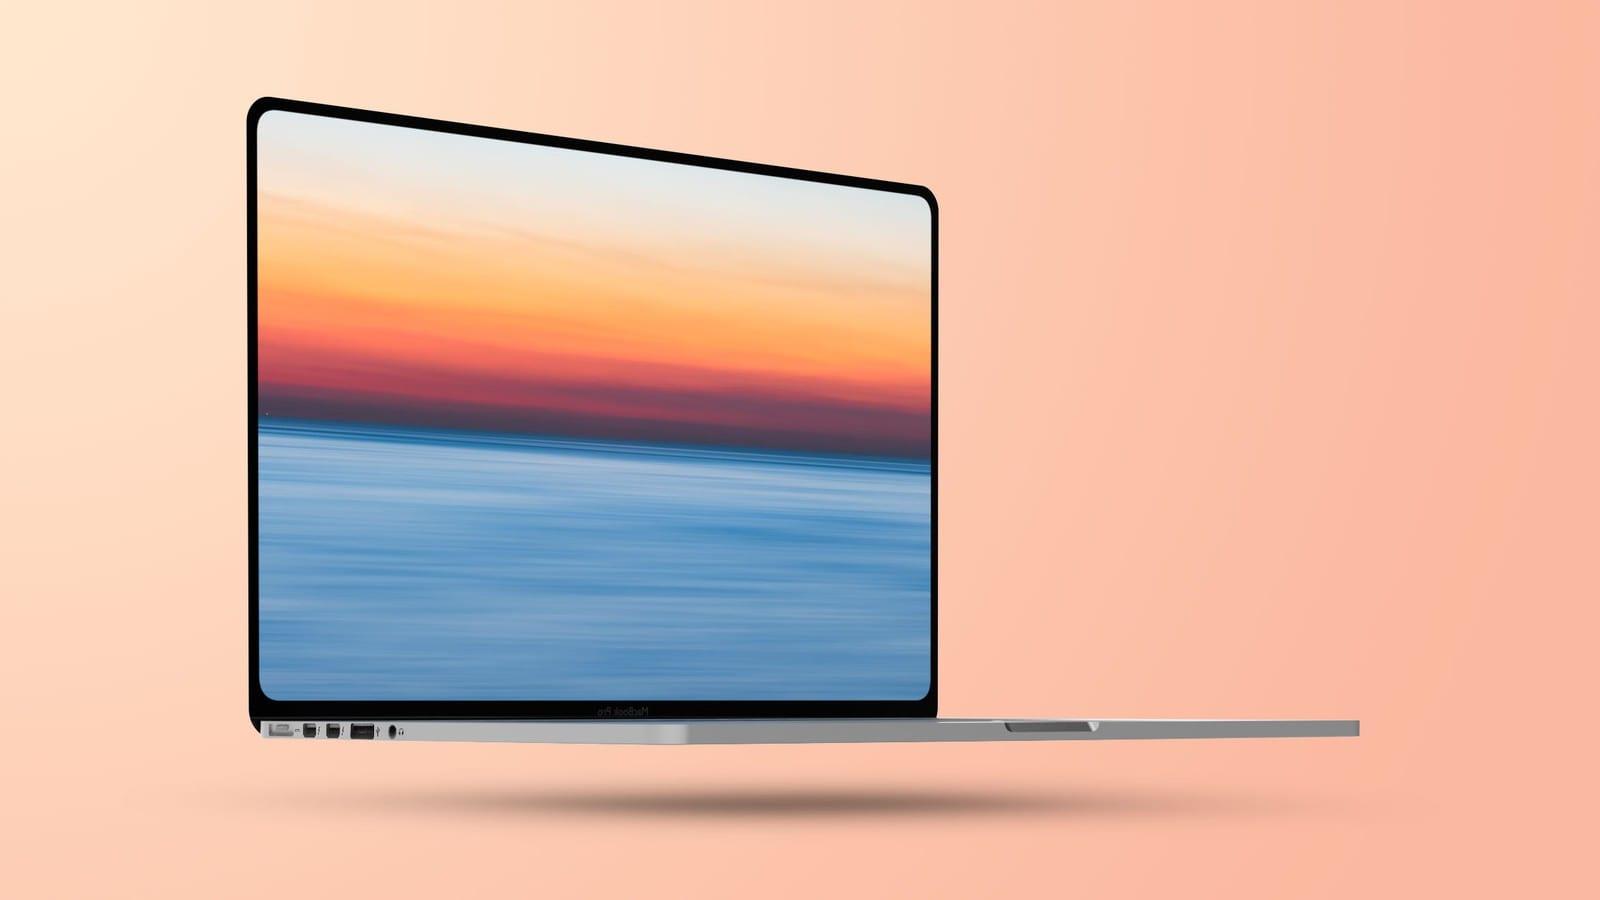 Flat 2021 MacBook Pro mockup